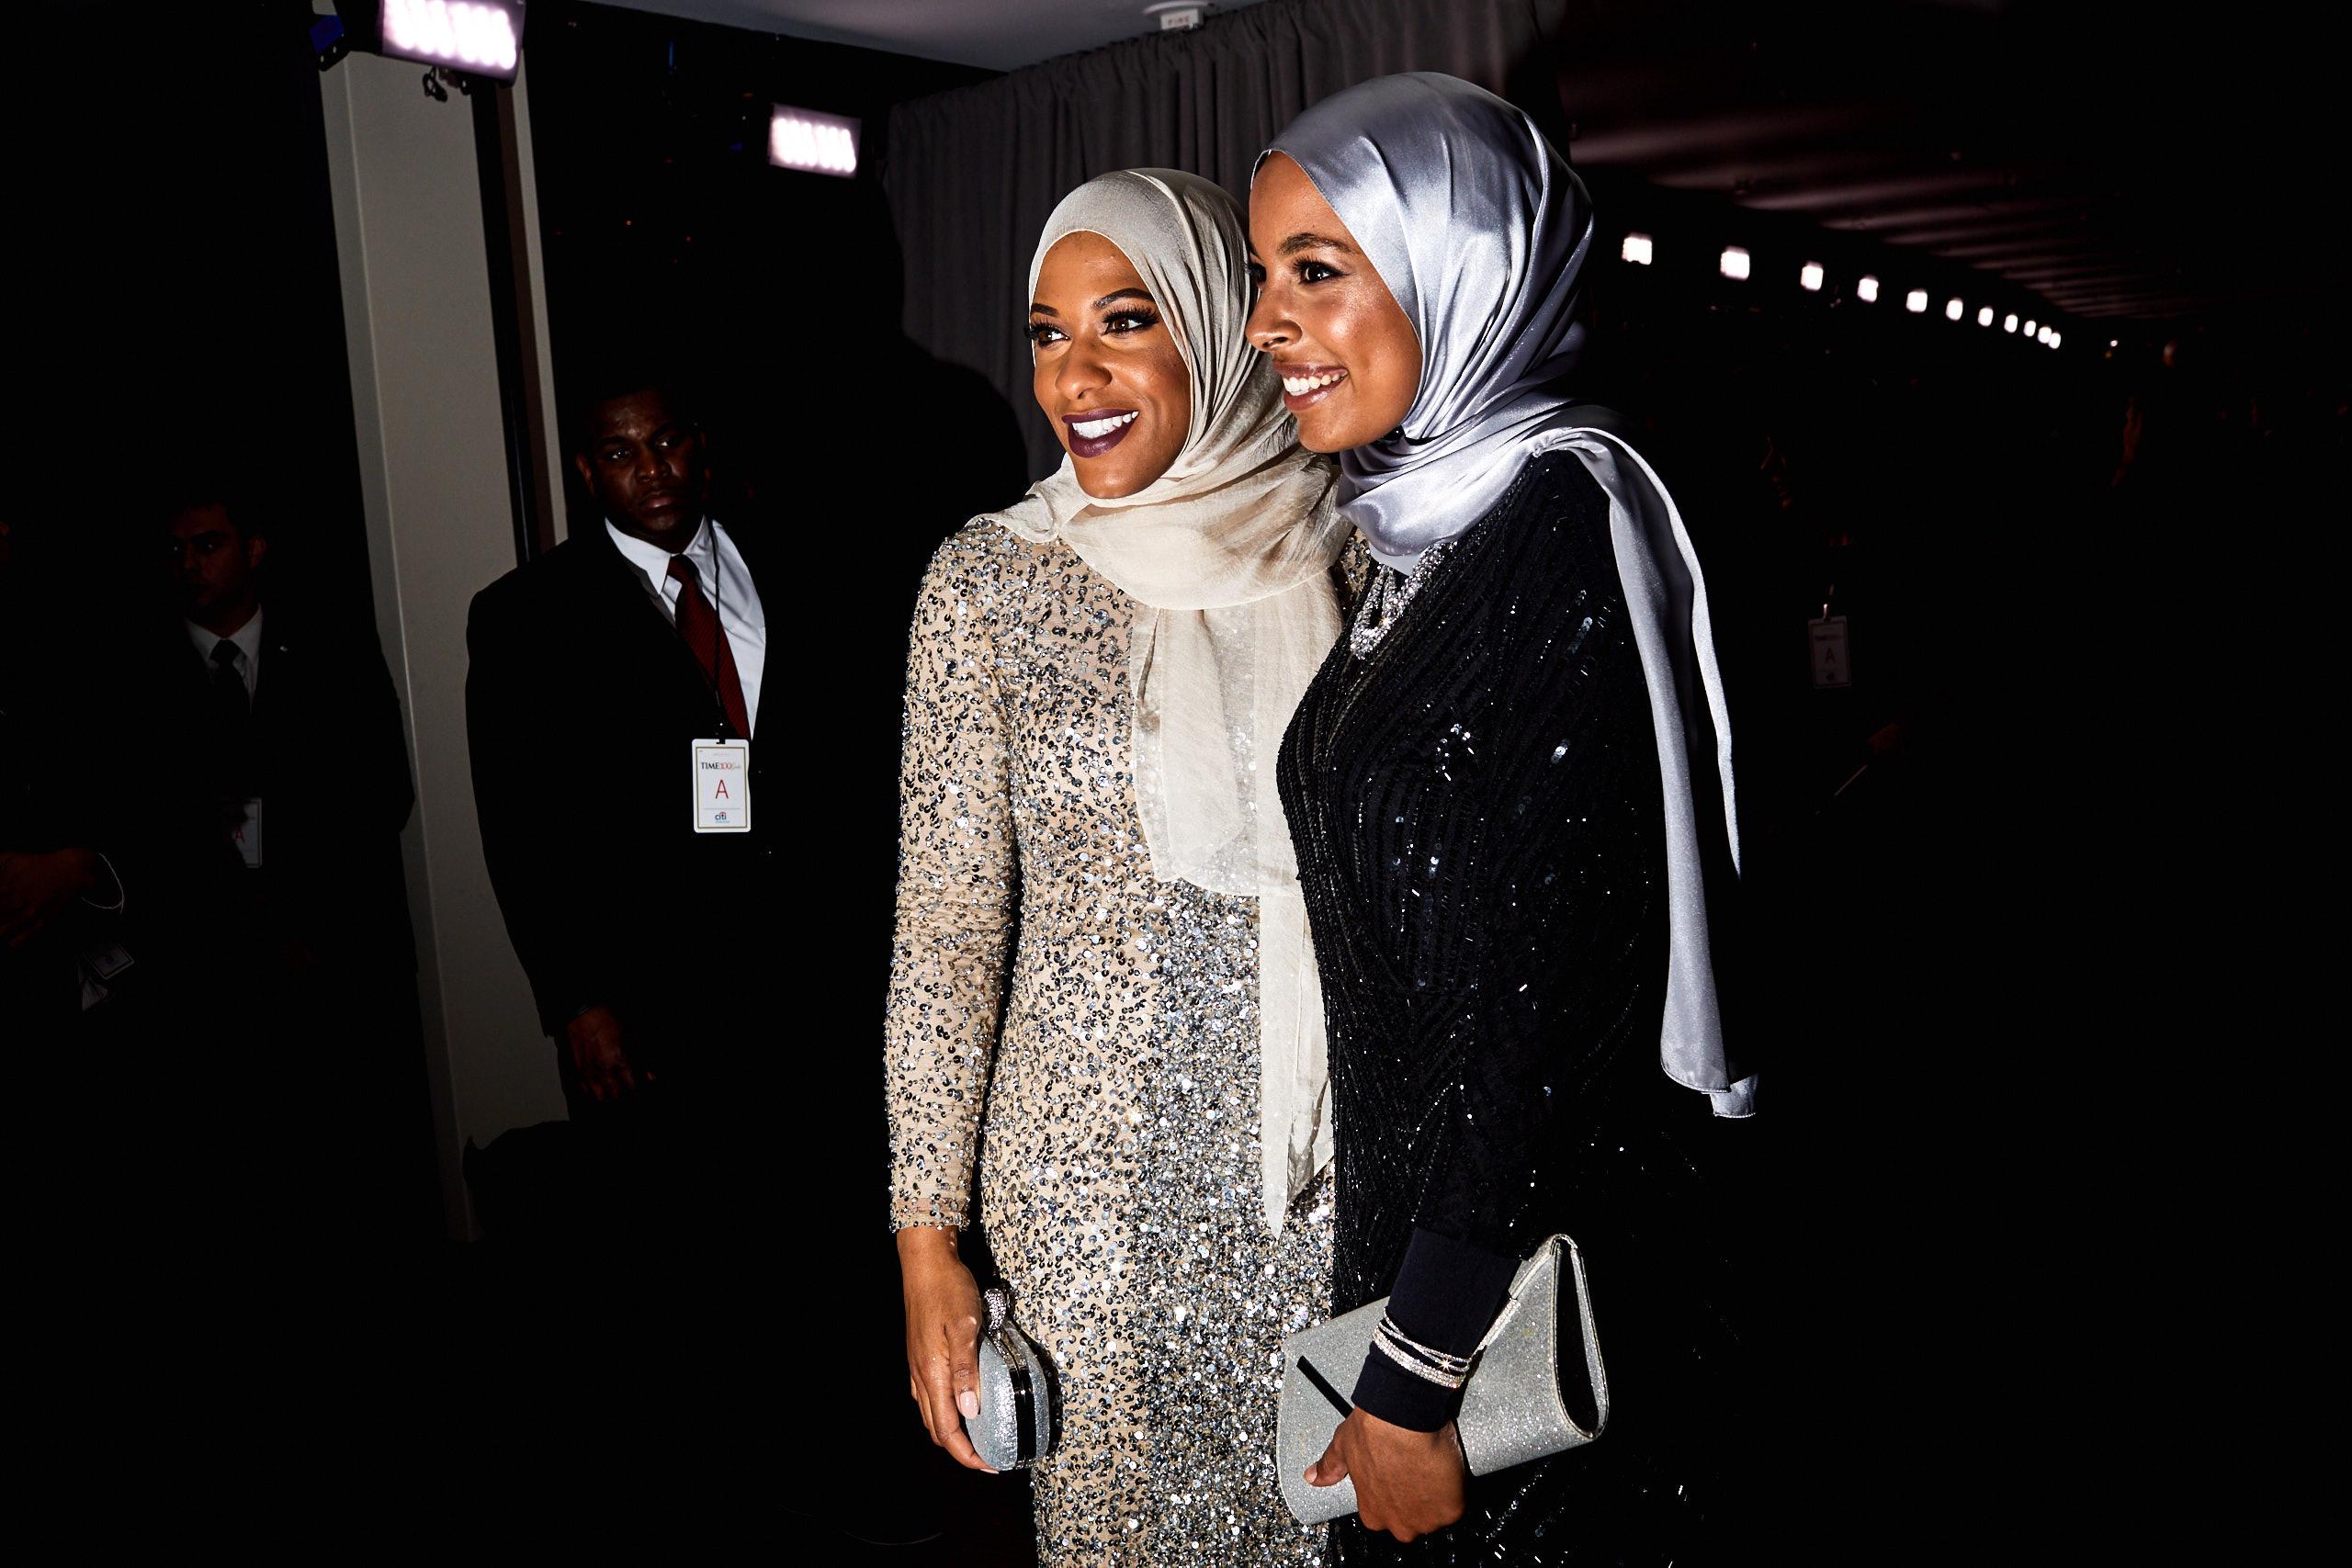 Ibtihaj Muhammad and Aya Elsekhaly at the Time 100 Gala at Jazz at Lincoln Center on April 25, 2017 in New York City.